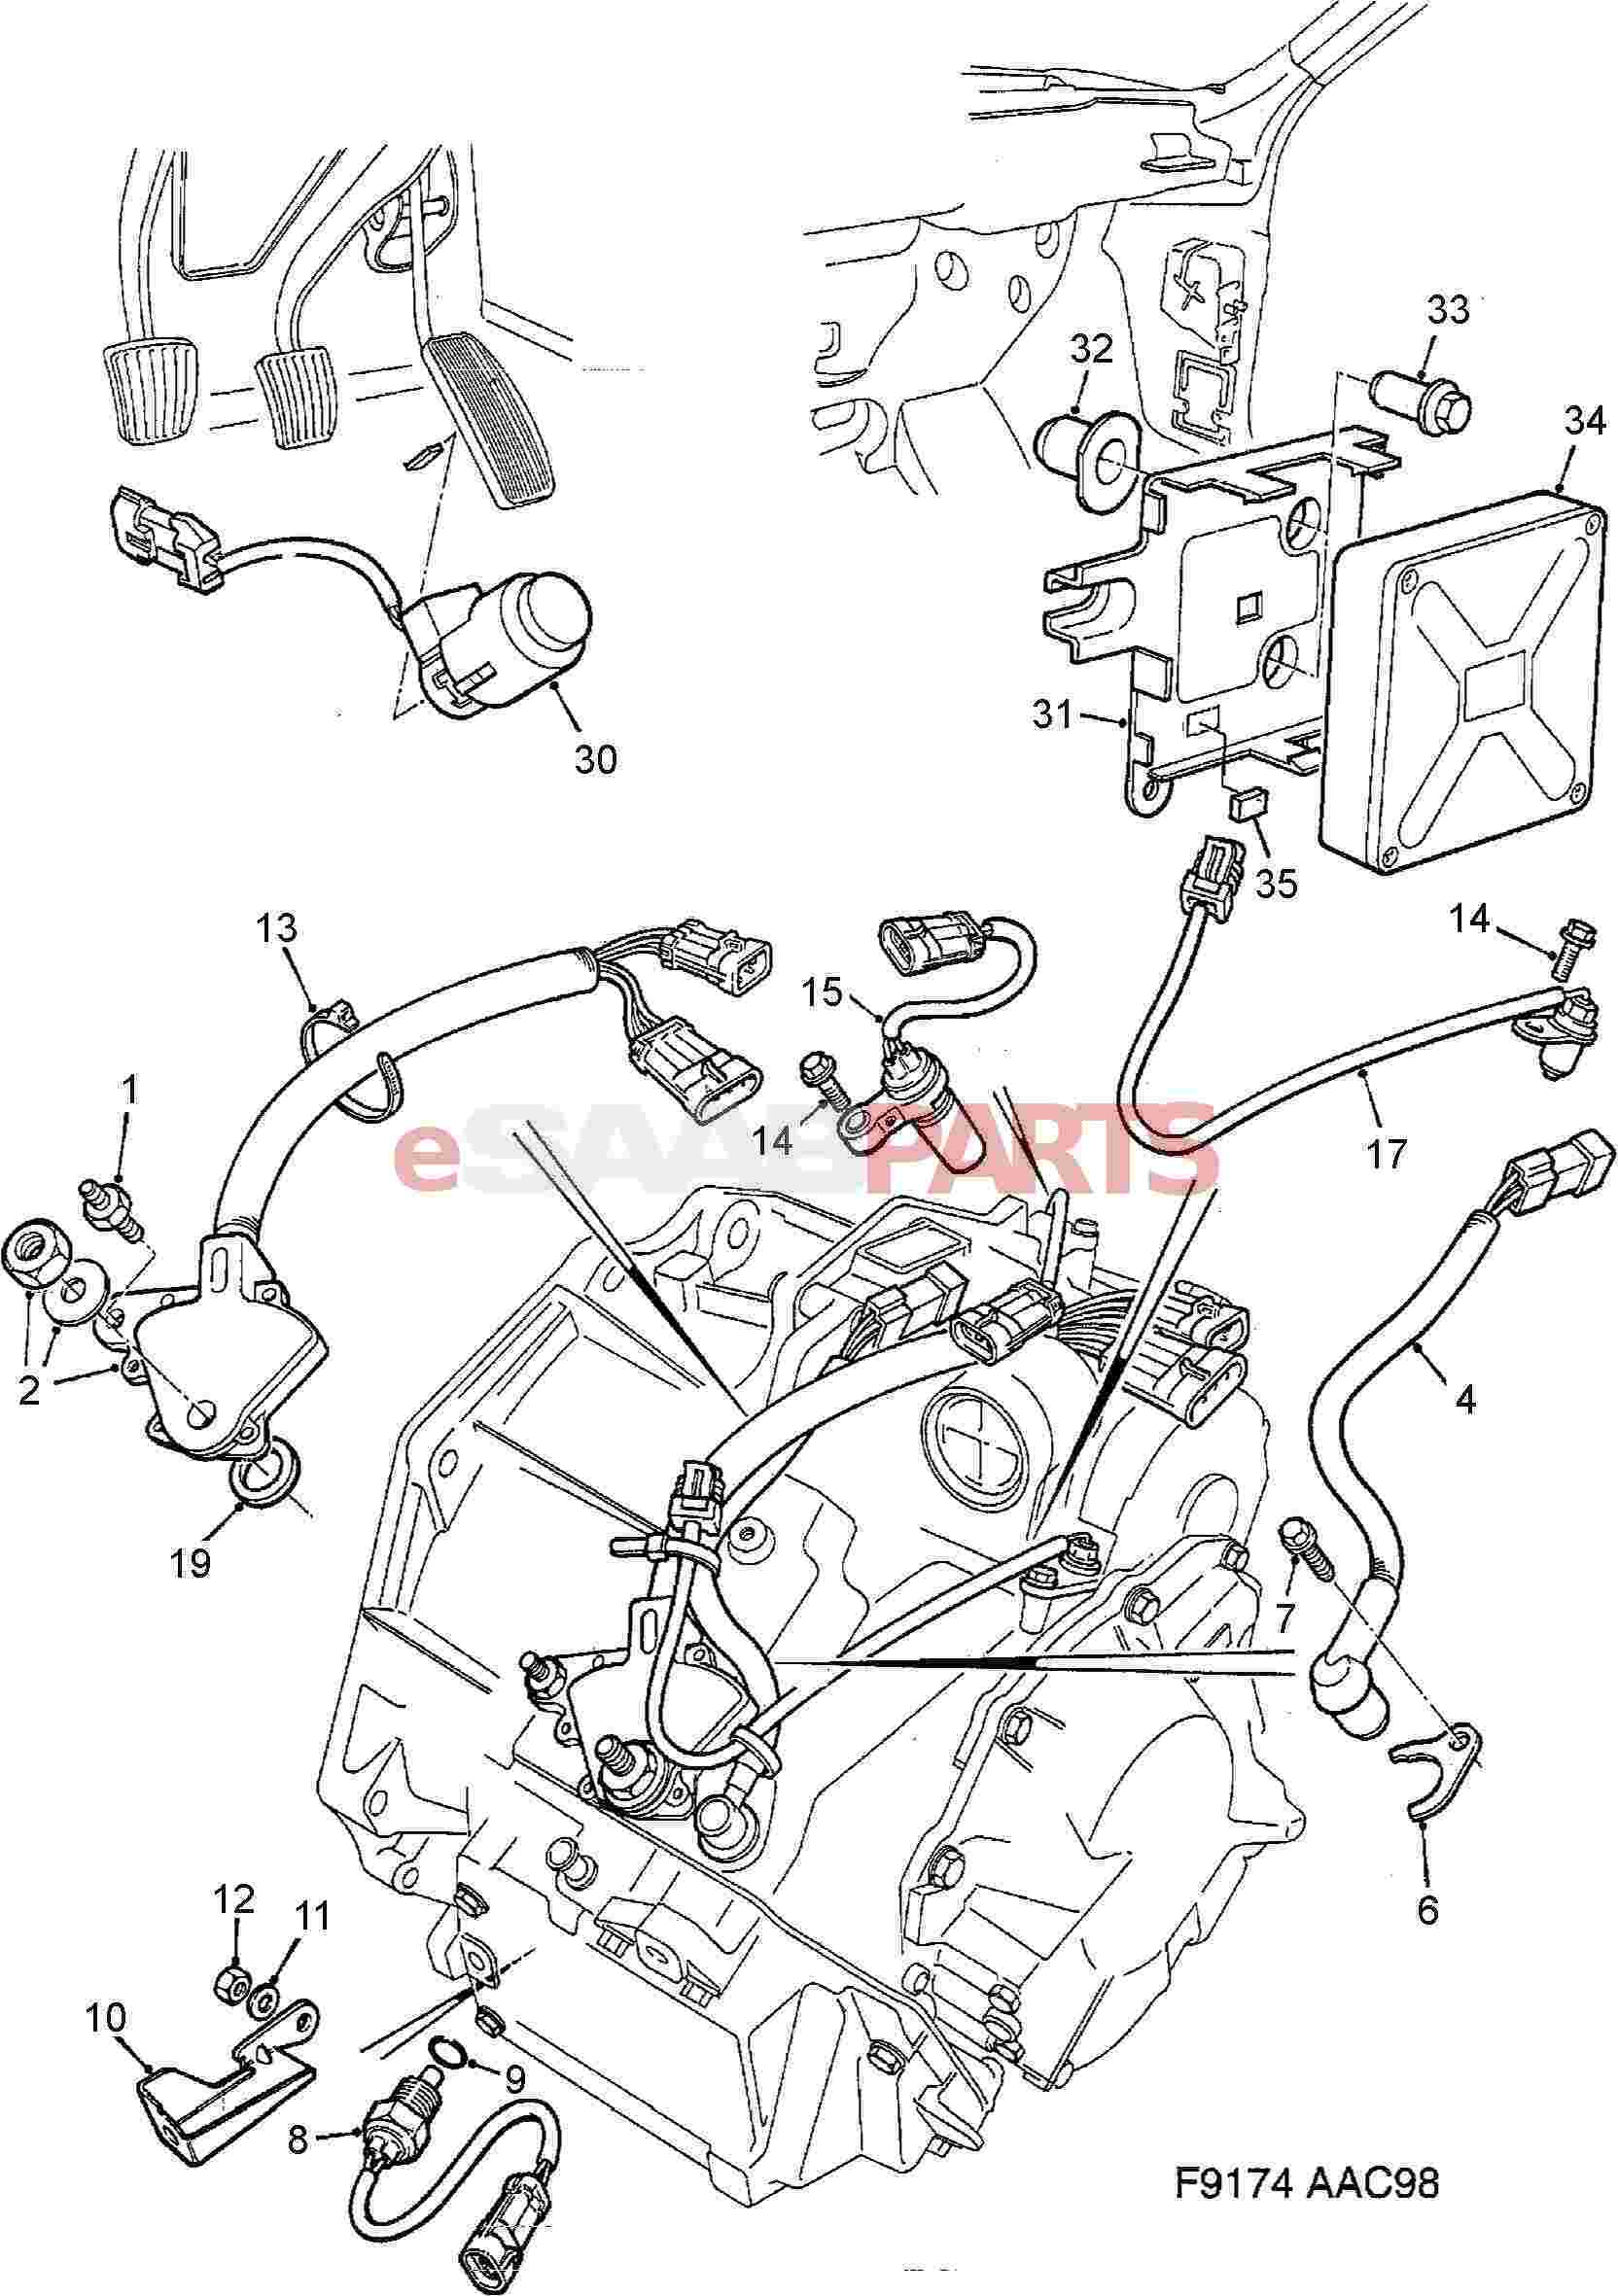 Saab Neutral Safety Switch